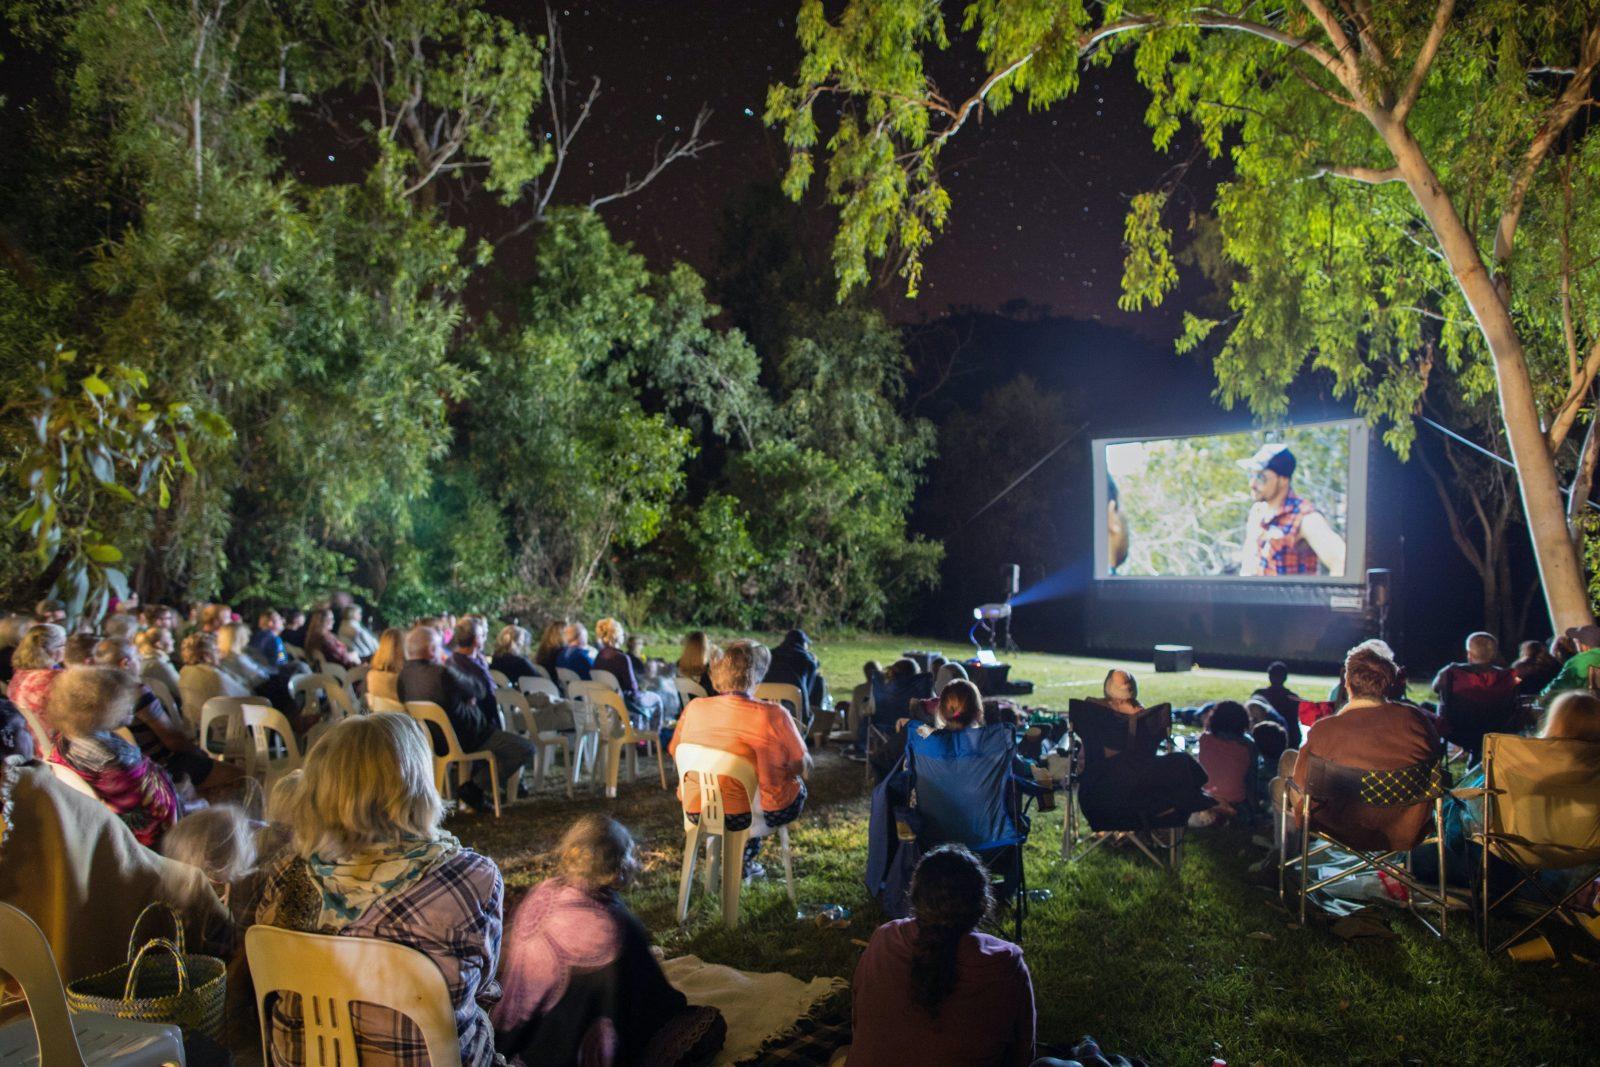 People watching films at night